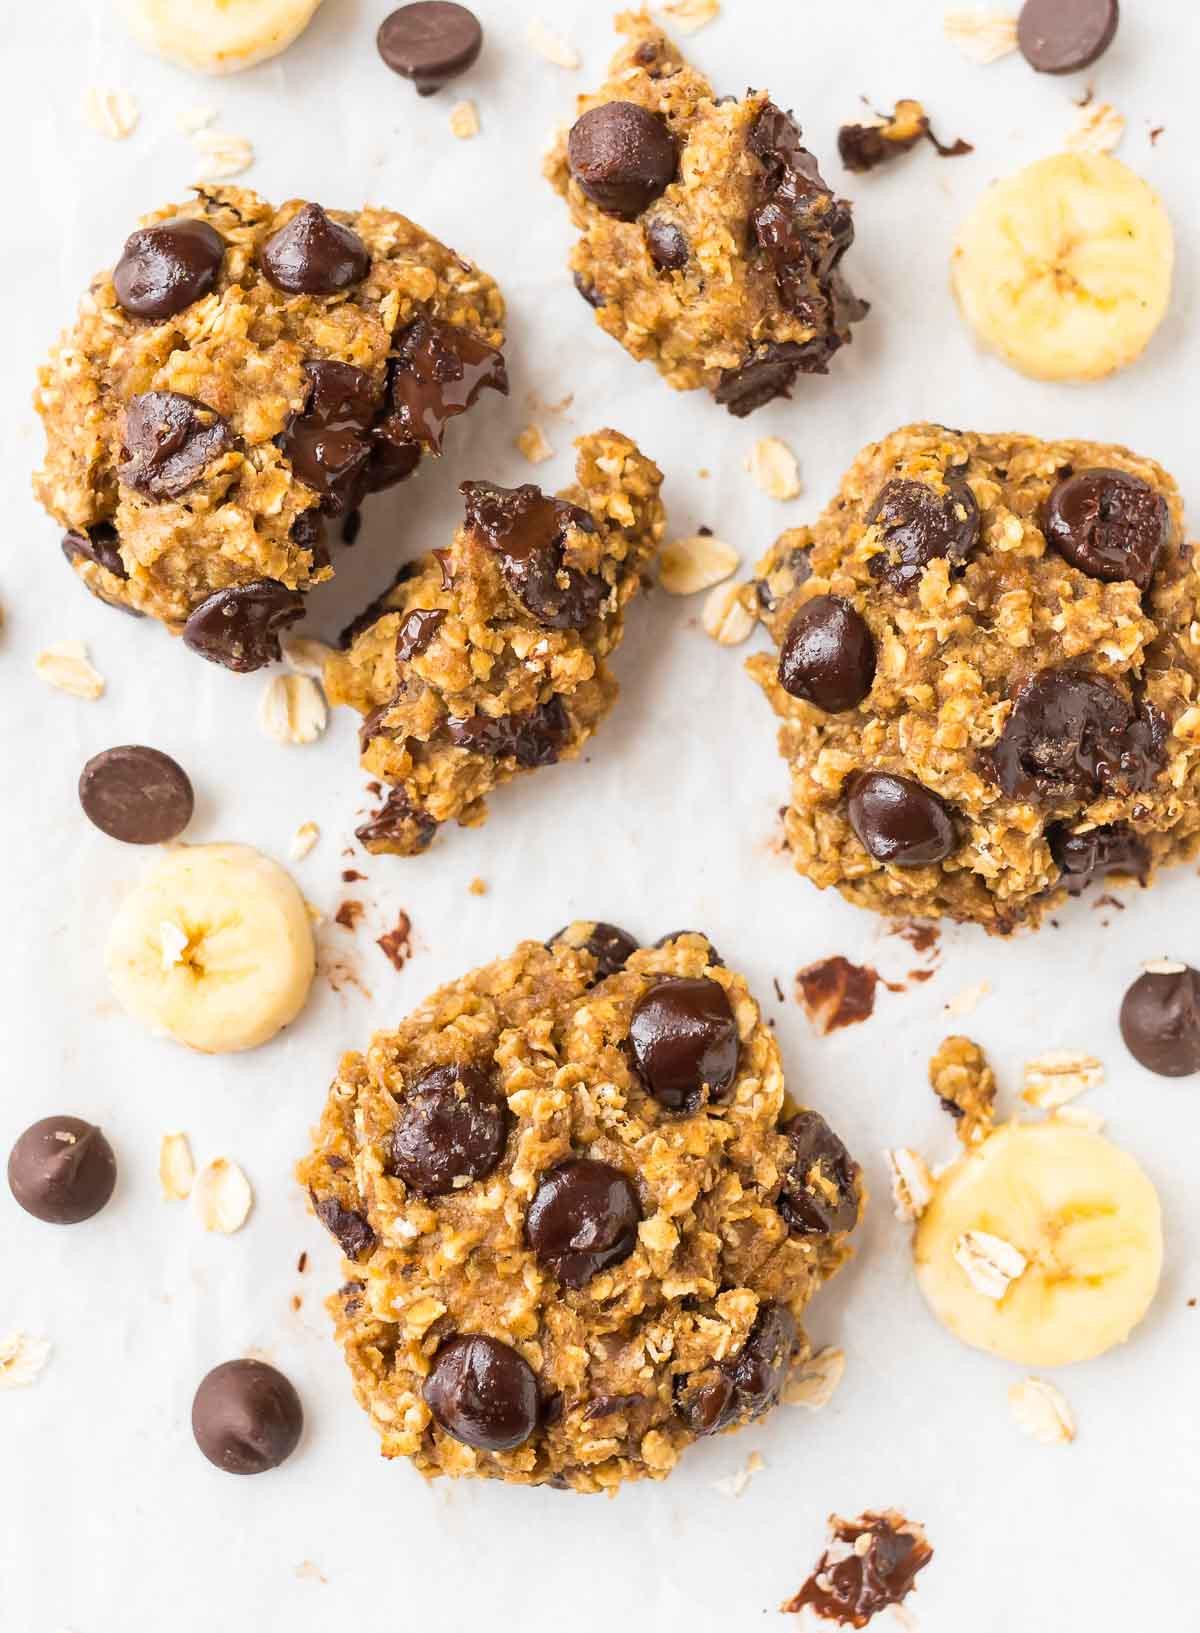 Healthy Banana Oatmeal Cookies  Healthy Banana Oatmeal Cookies with Chocolate Chips